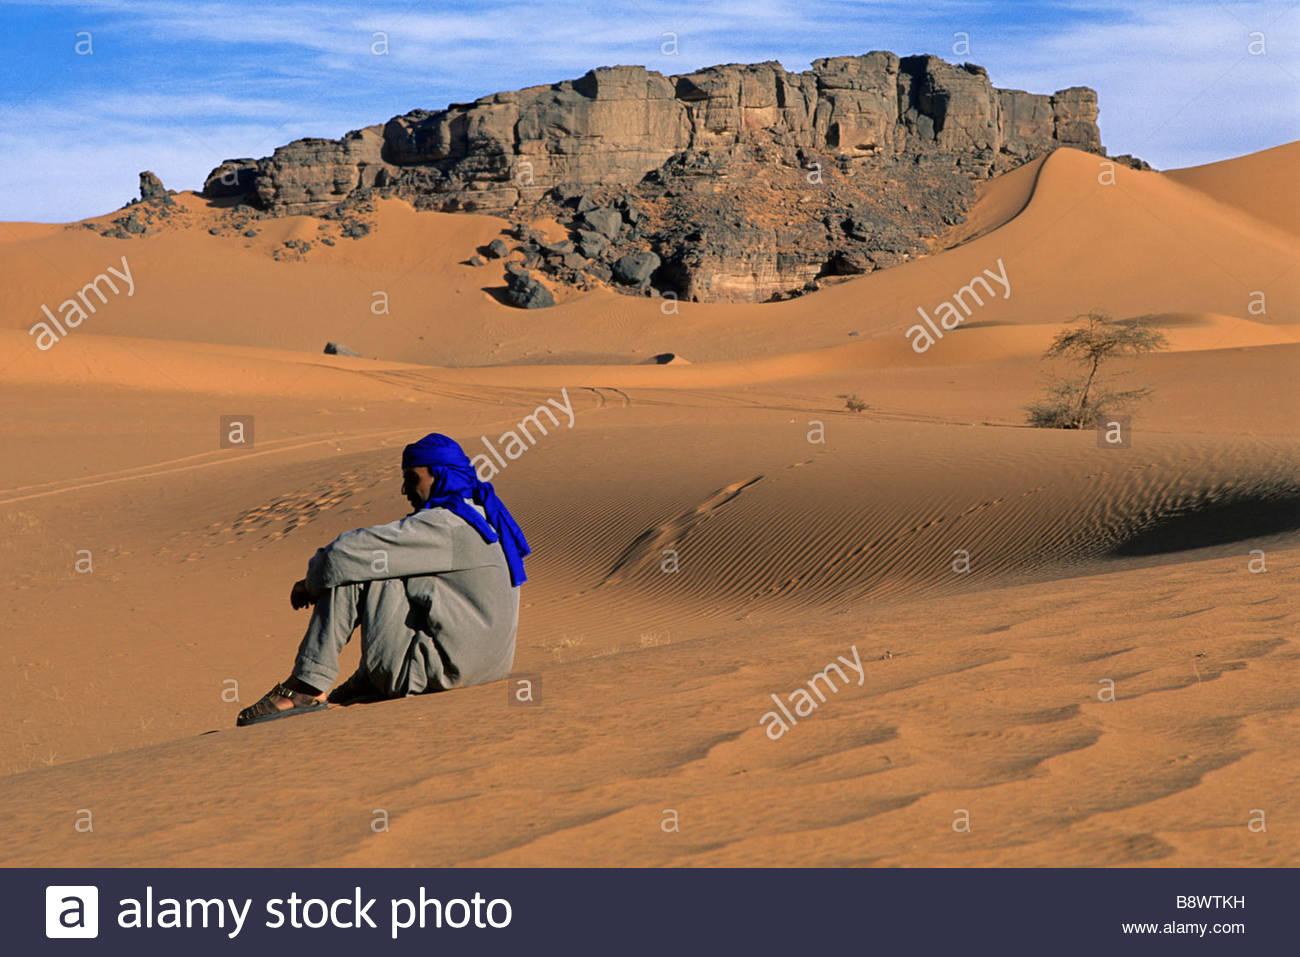 fezzan, desert lybian, tuareg, lybia, africa - Stock Image